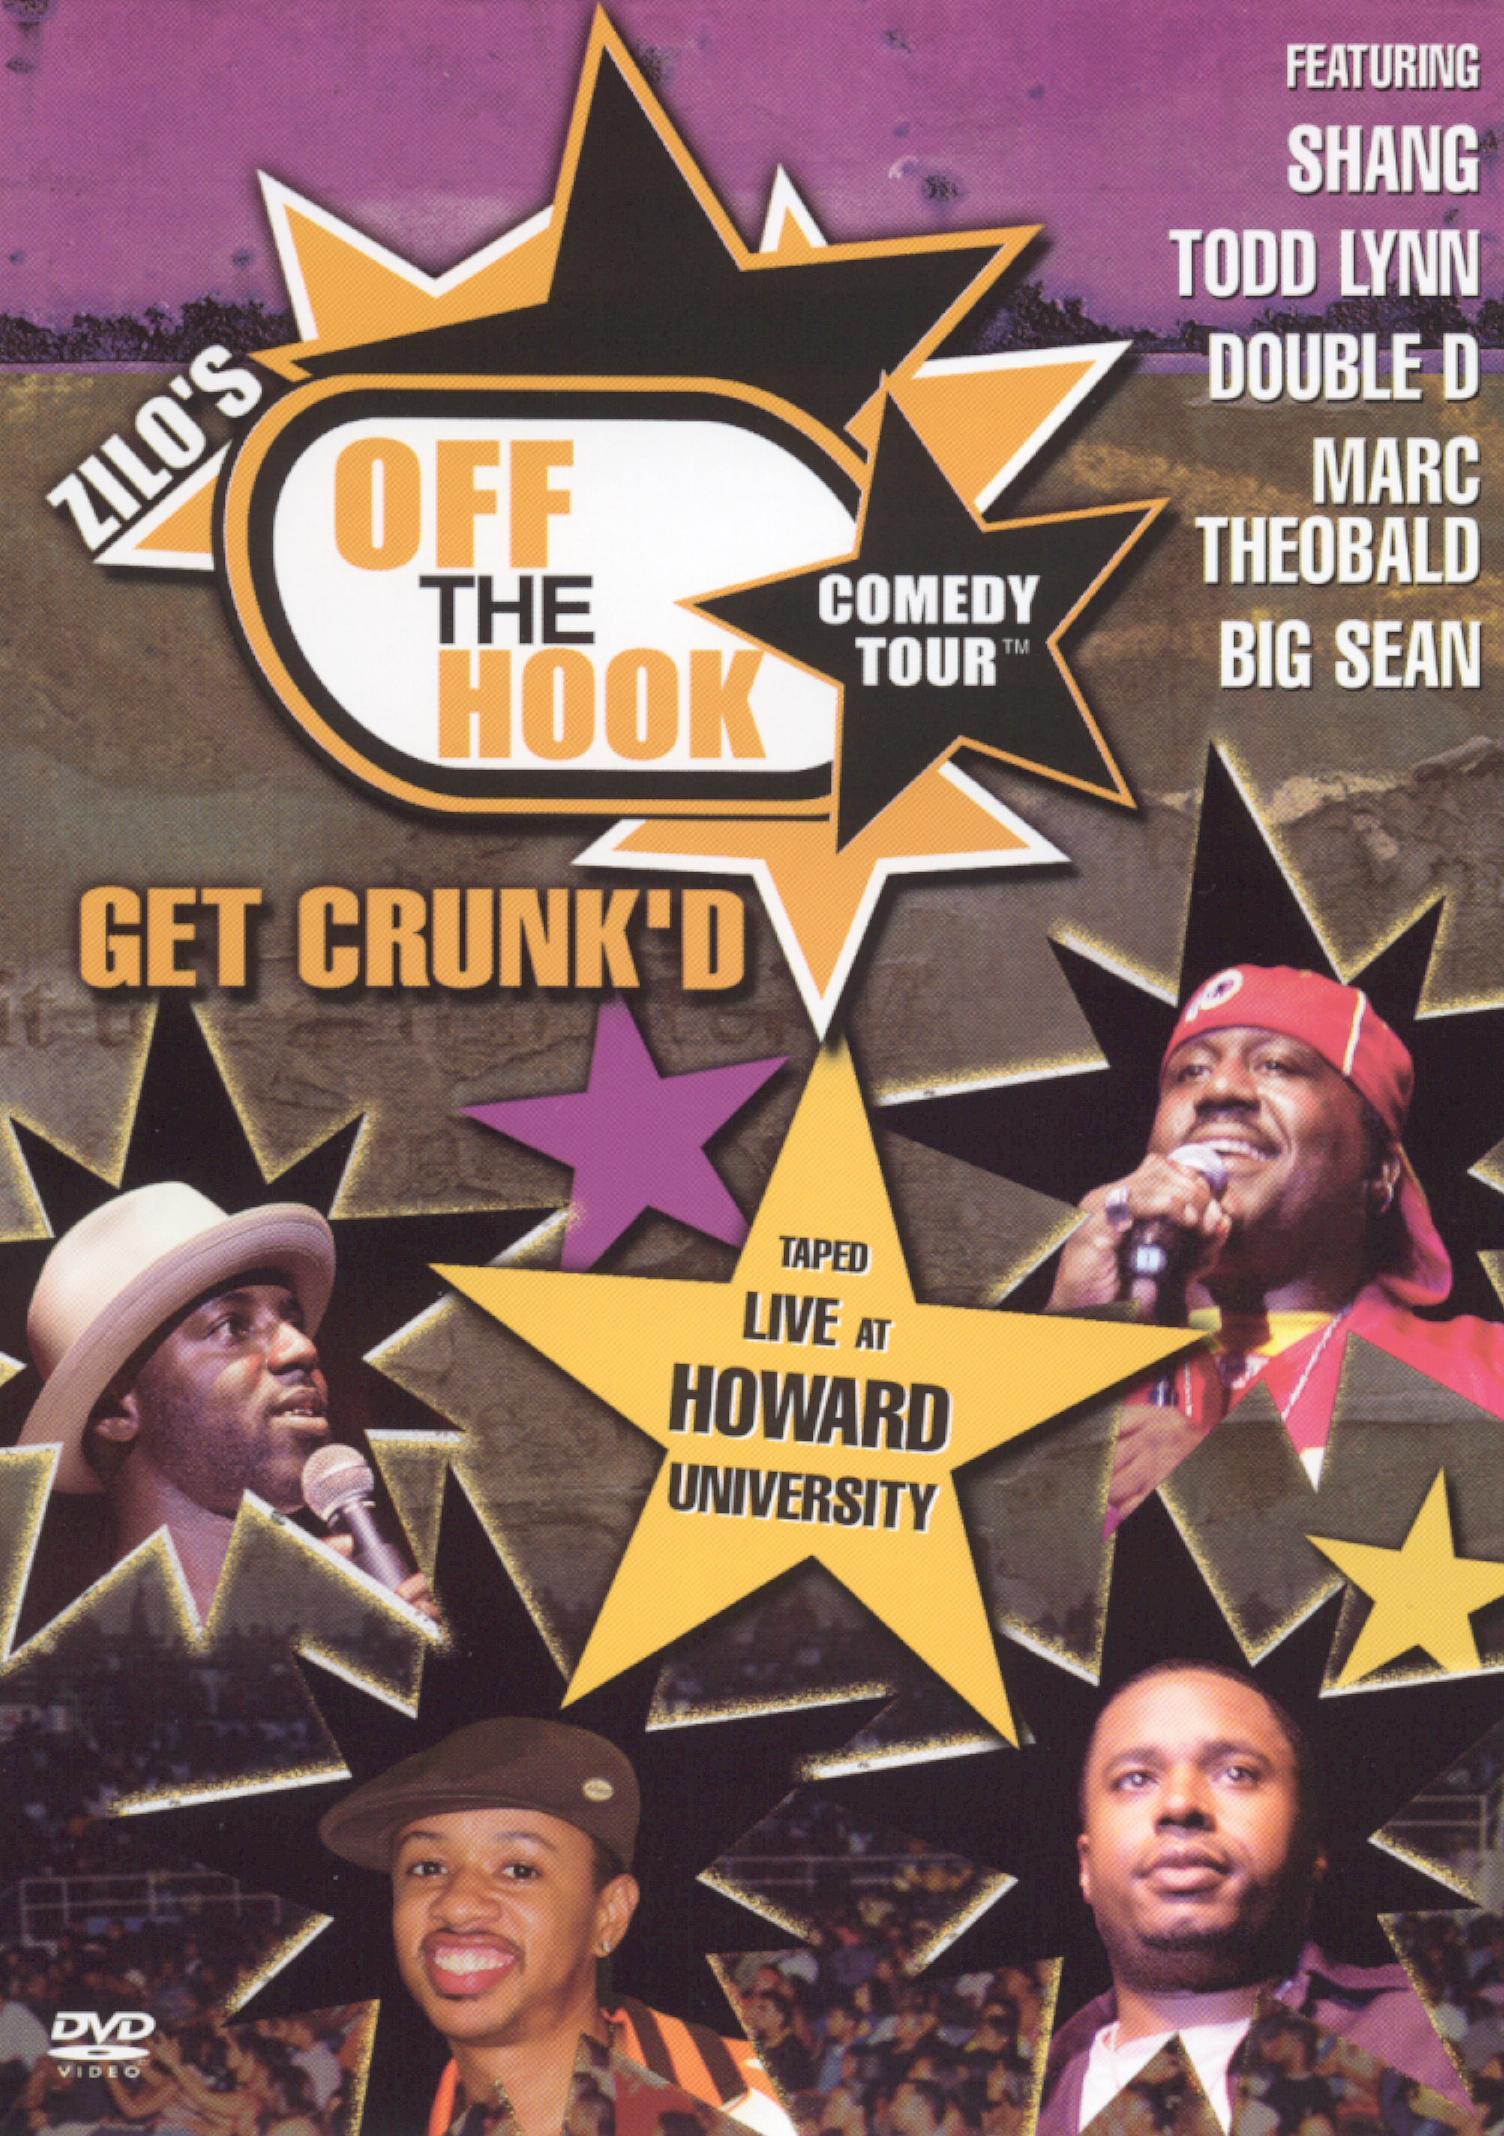 Off the Hook Comedy Tour, Vol. 2: Get Crunk'd